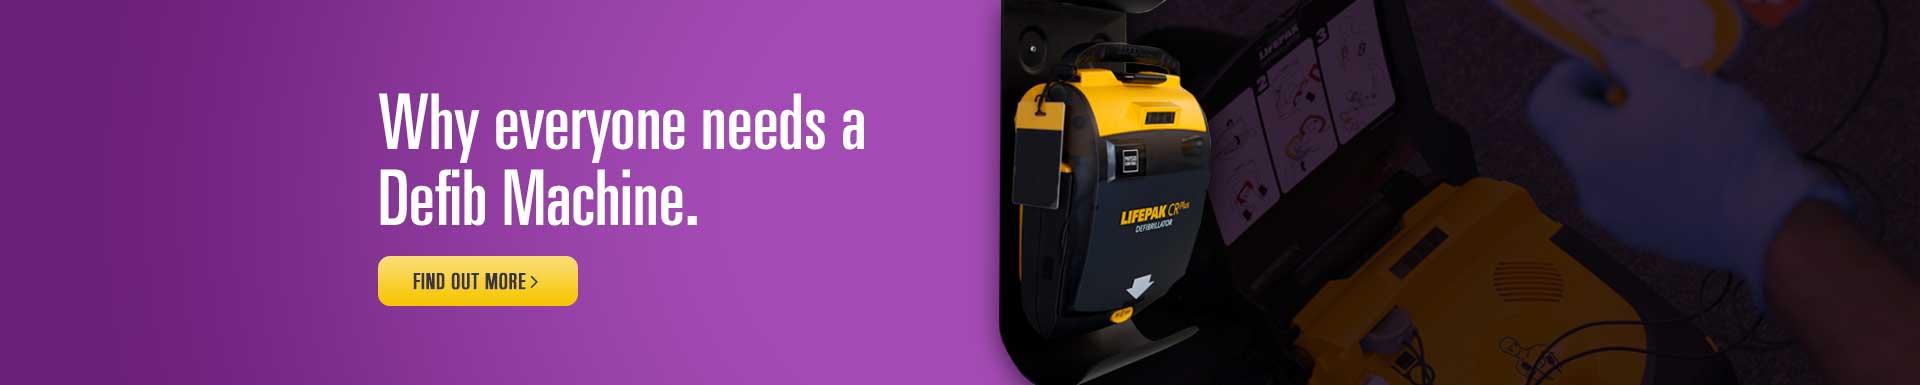 Why Everyone needs a defibrillator